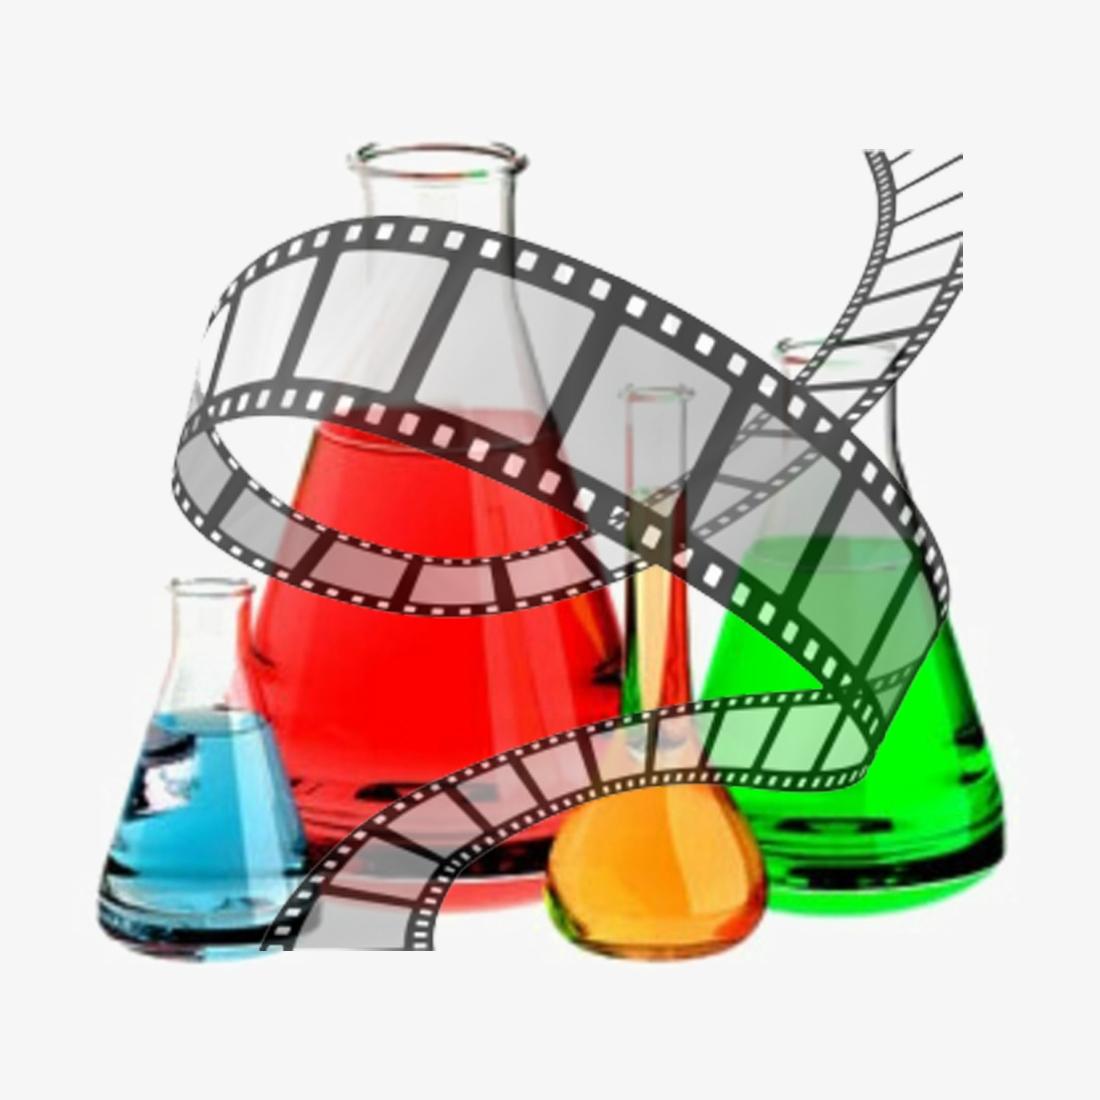 Chimicale filme foto